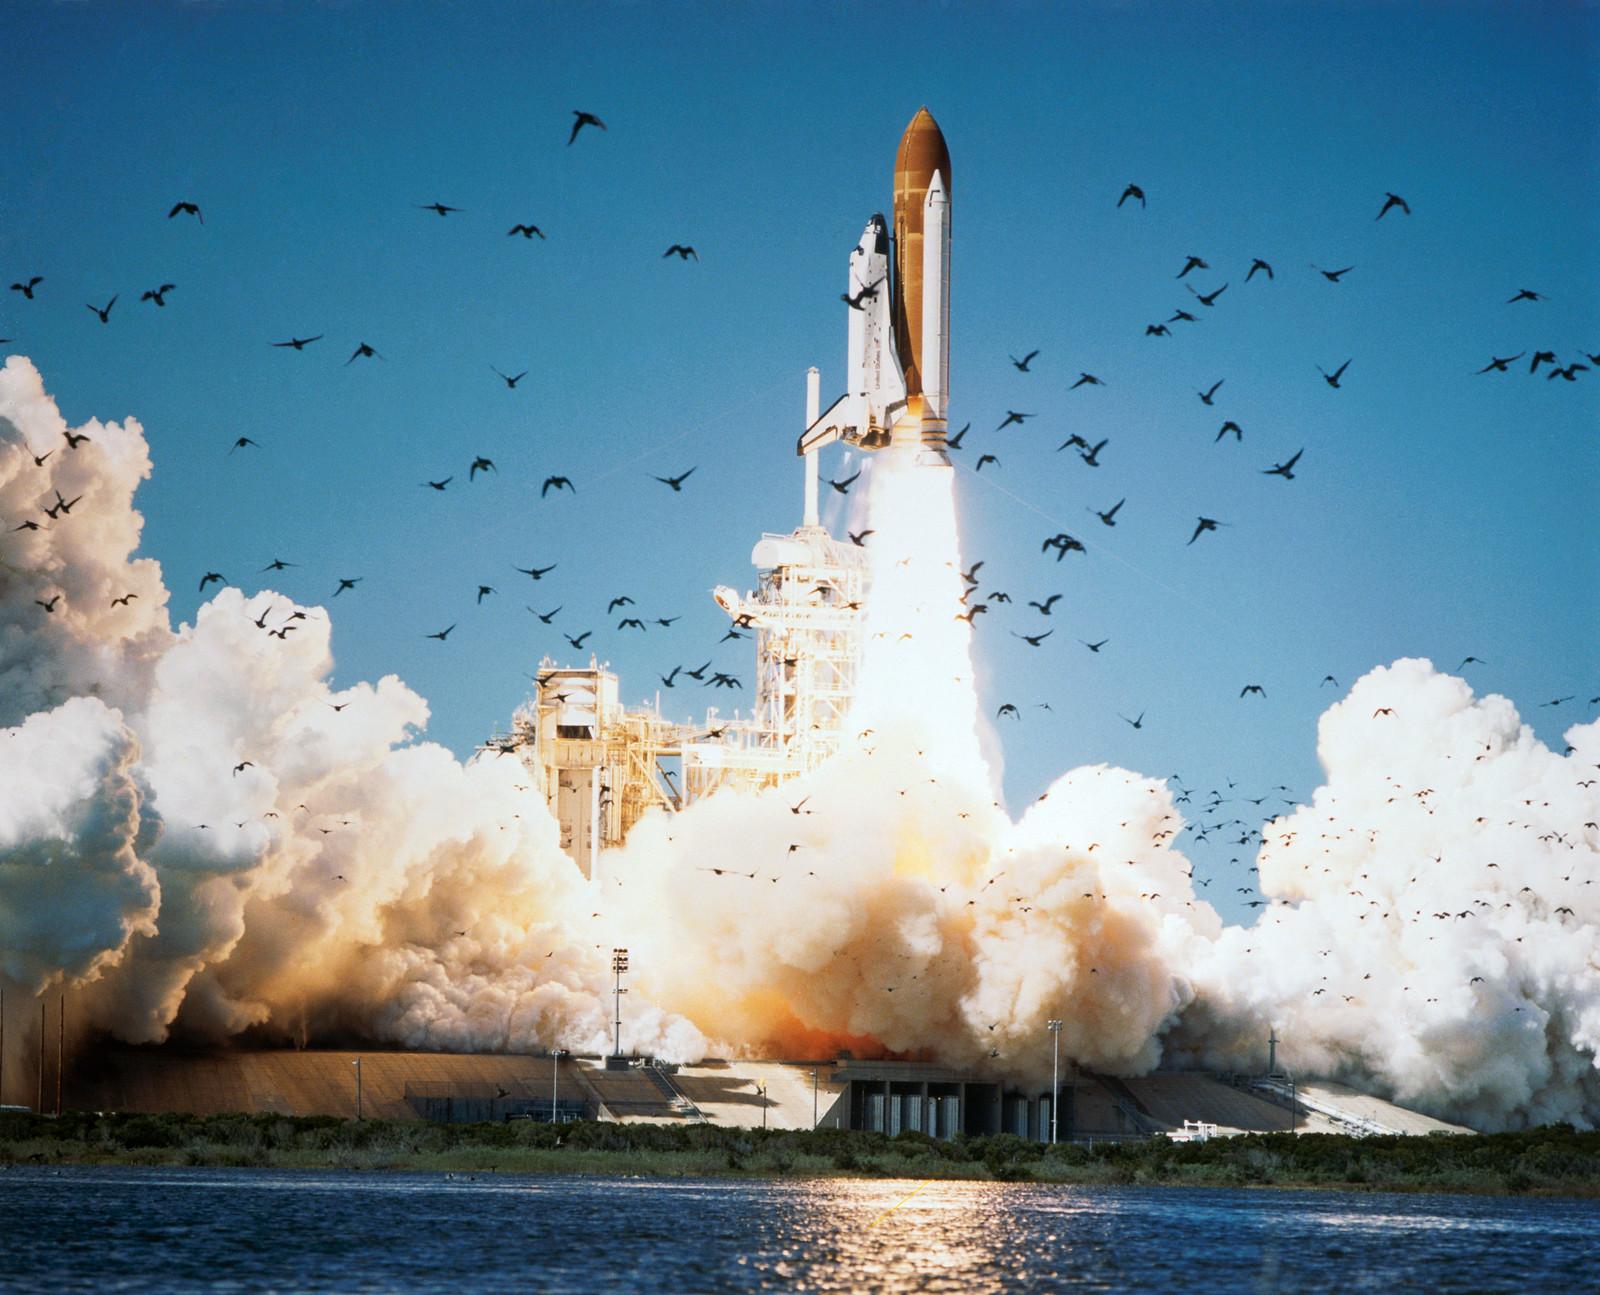 space shuttle challenger last transmission - photo #7